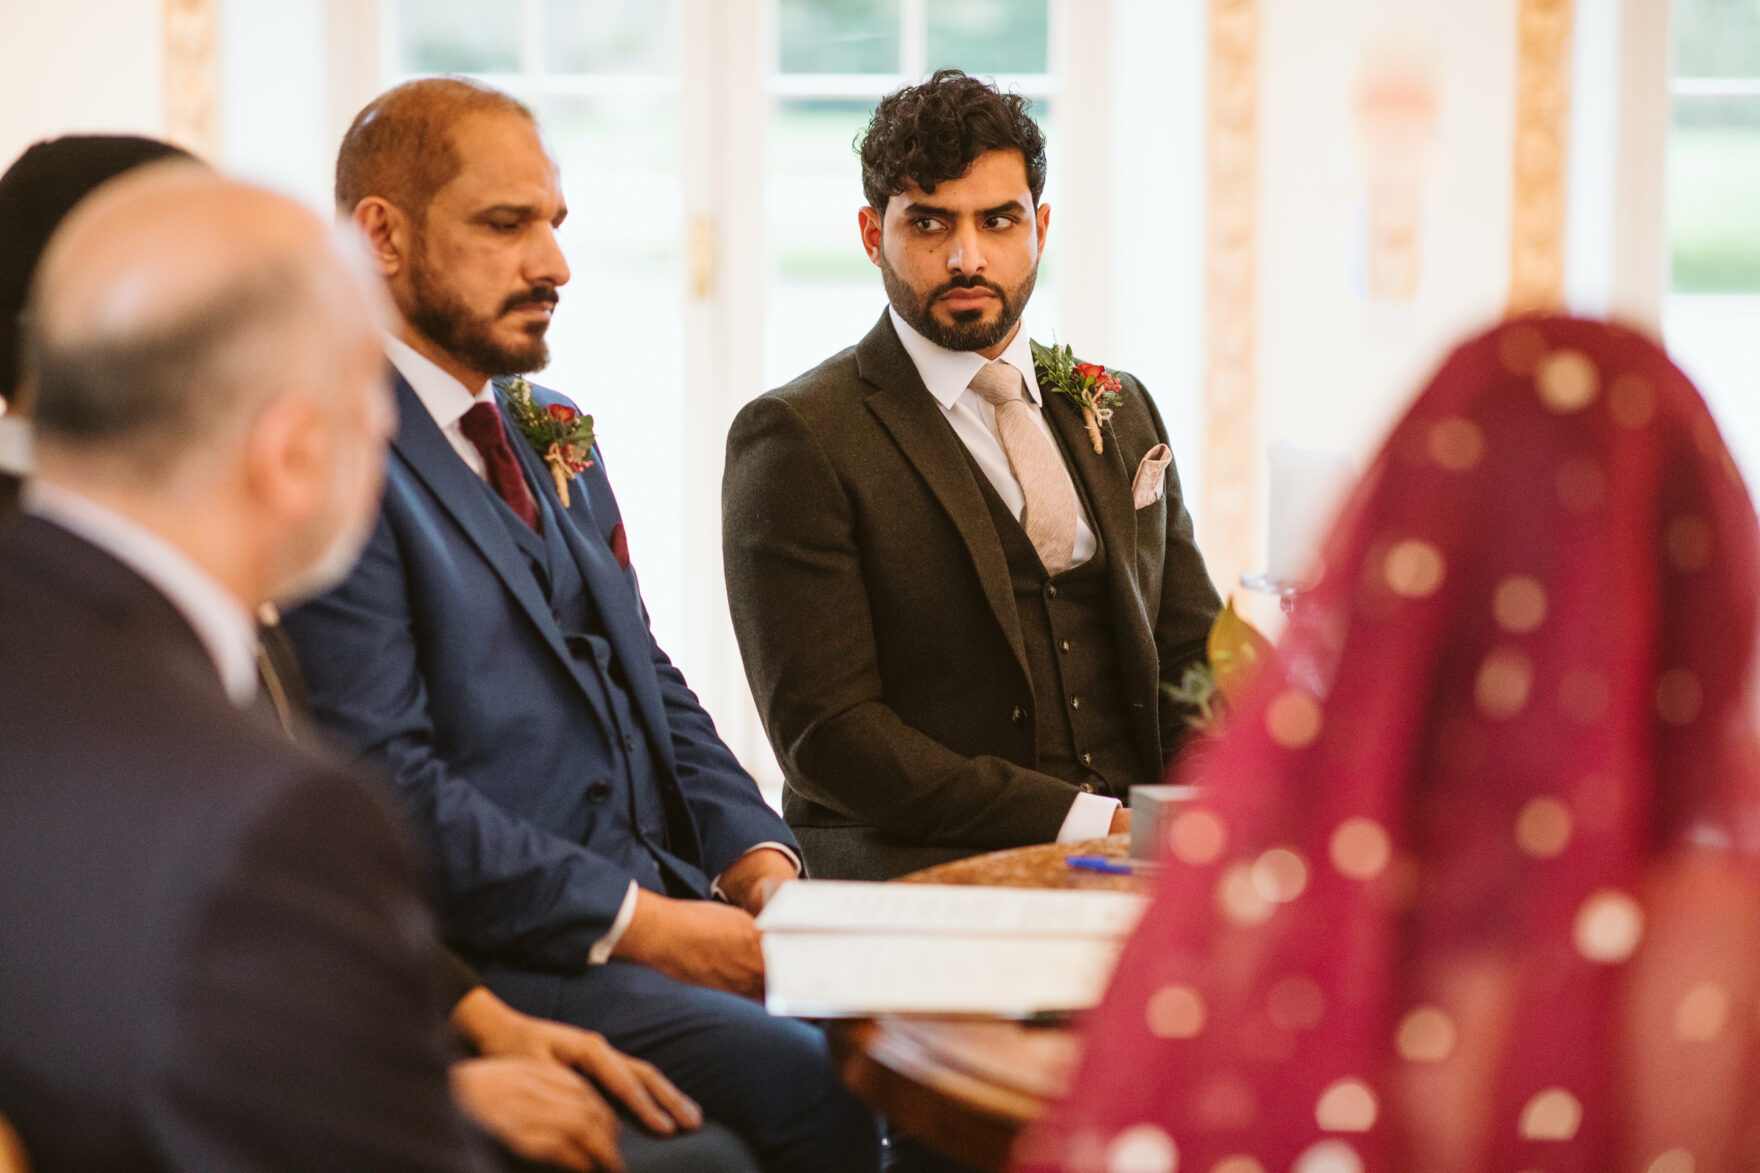 Groom at his nikkah ceremony